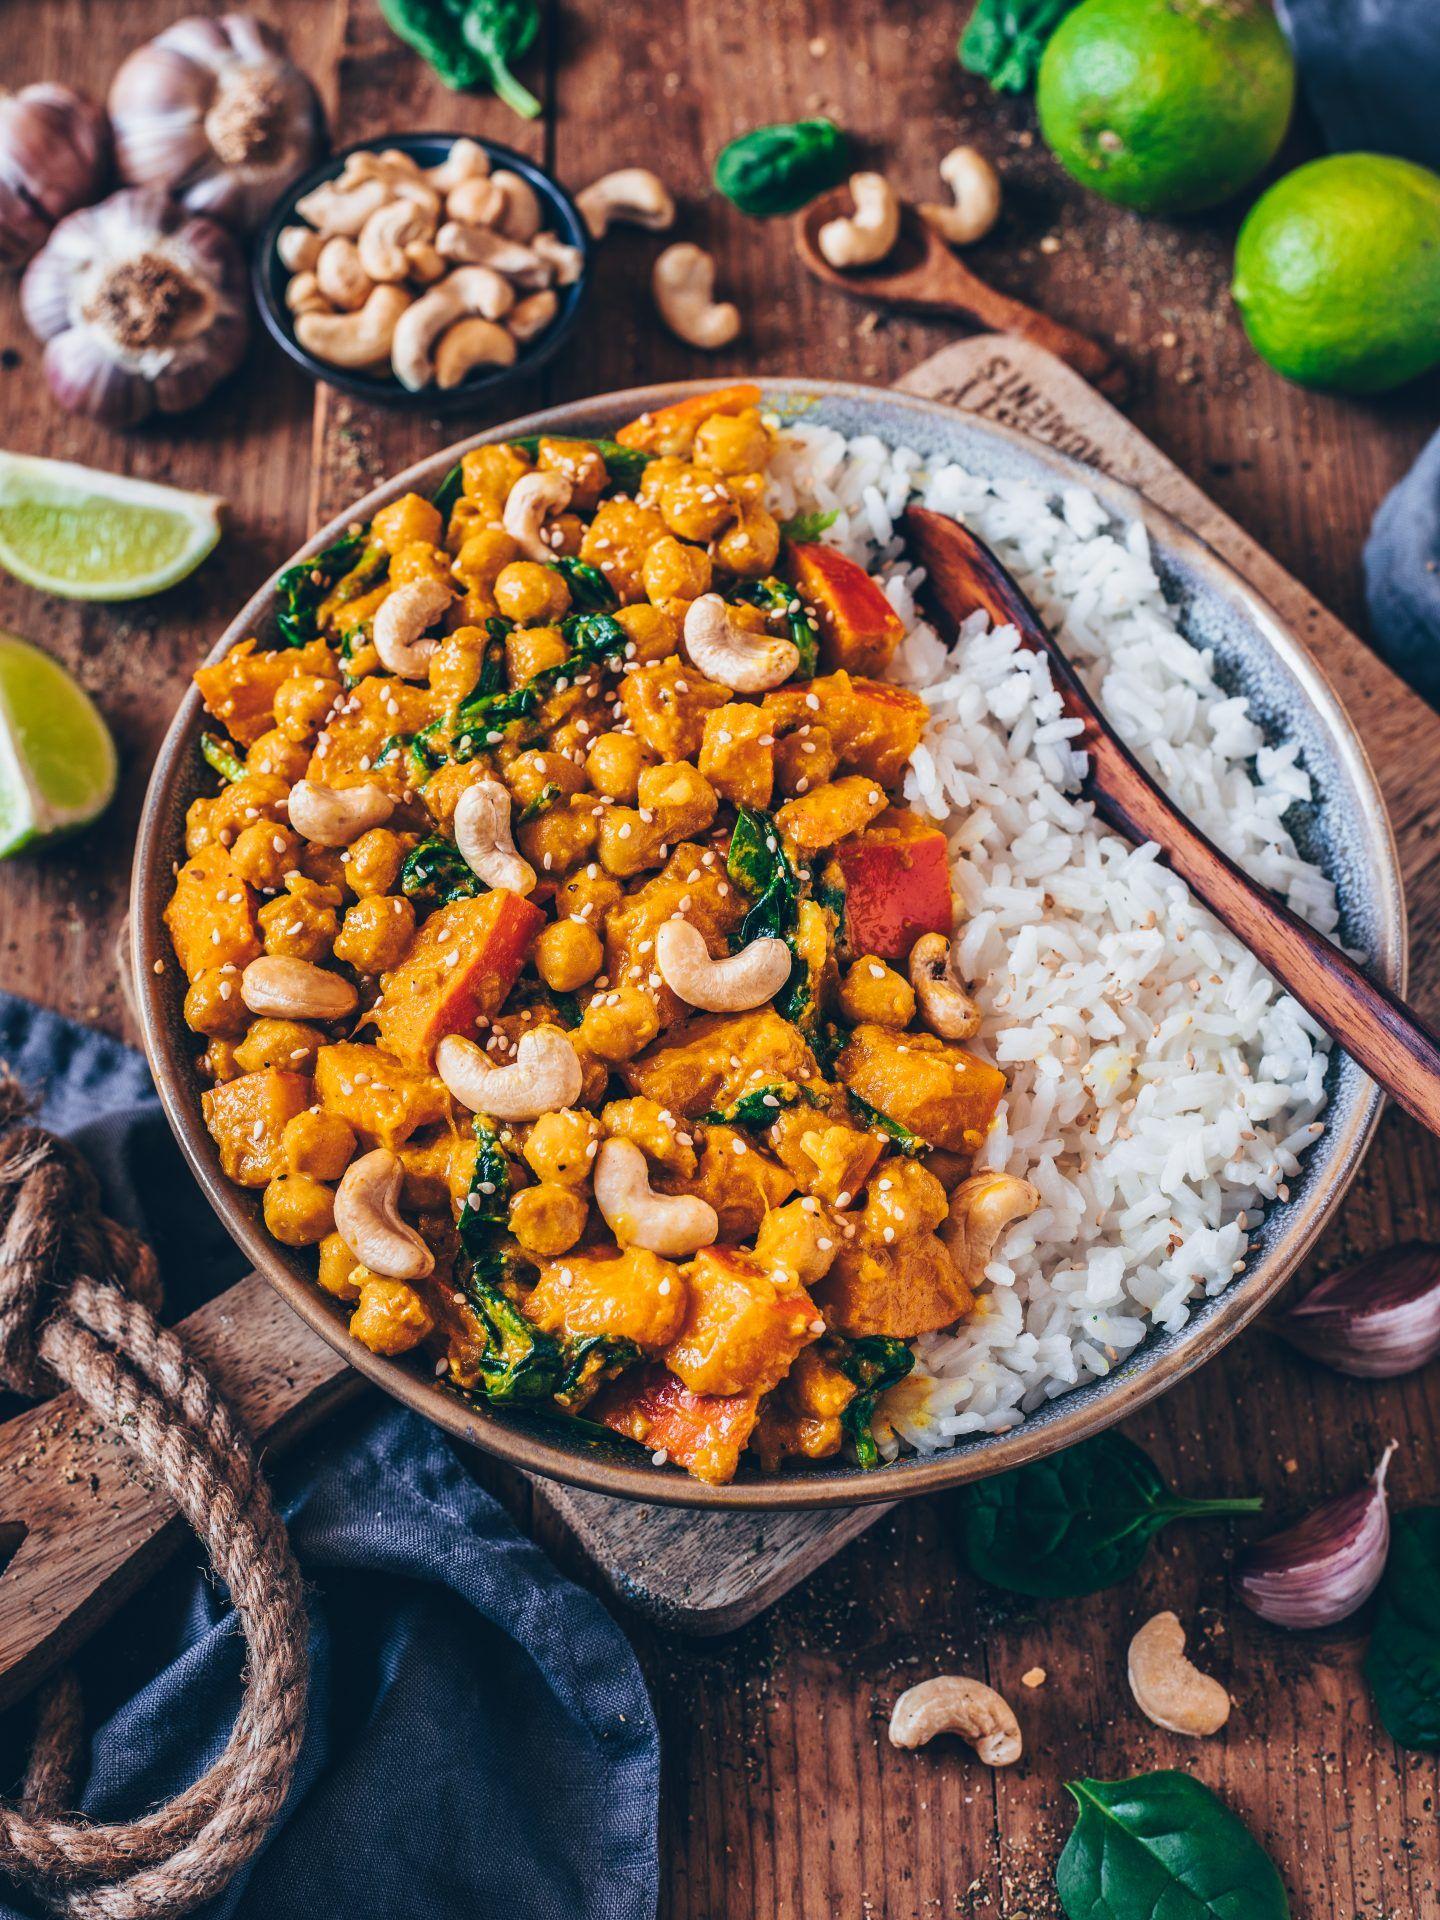 Kürbis-Kichererbsen-Curry (vegan, einfaches Rezept) - Bianca Zapatka   Rezepte